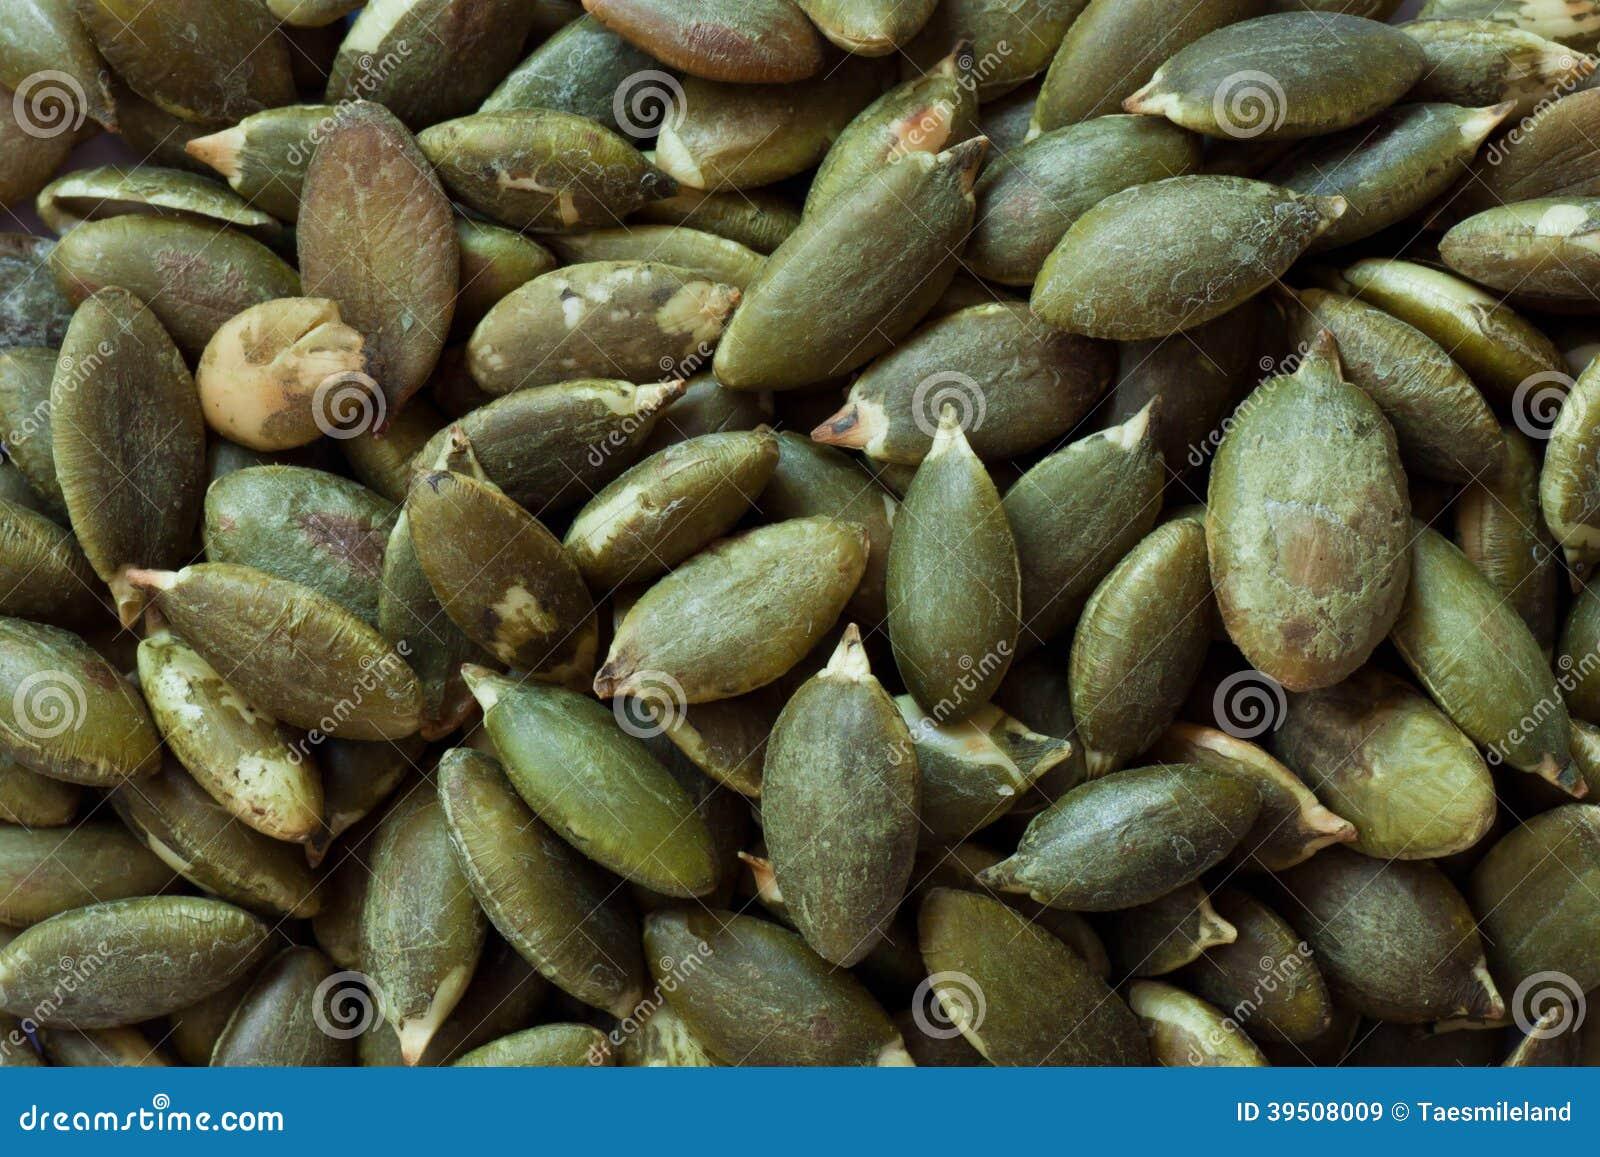 Download Pumpkin seeds stock image. Image of seeds, agriculture - 39508009